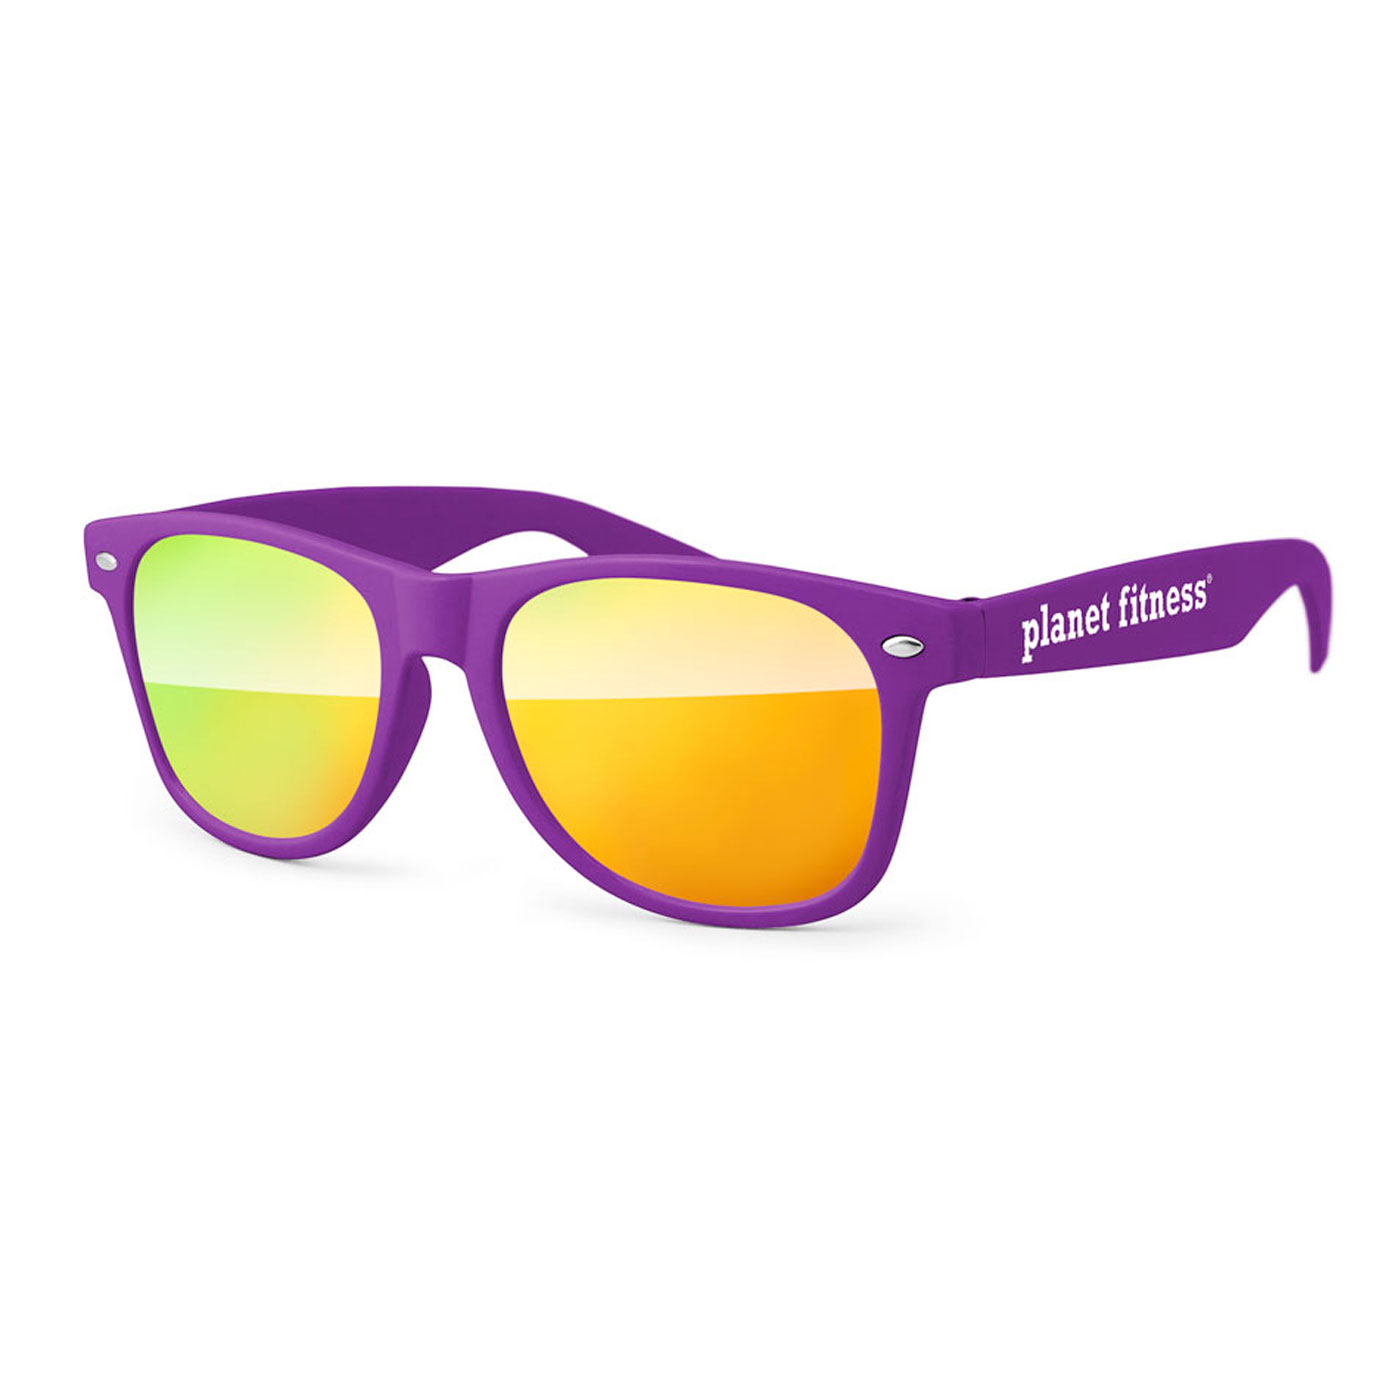 9119b56b8 Retro Mirrored Sunglasses | Planet Fitness Store Canada